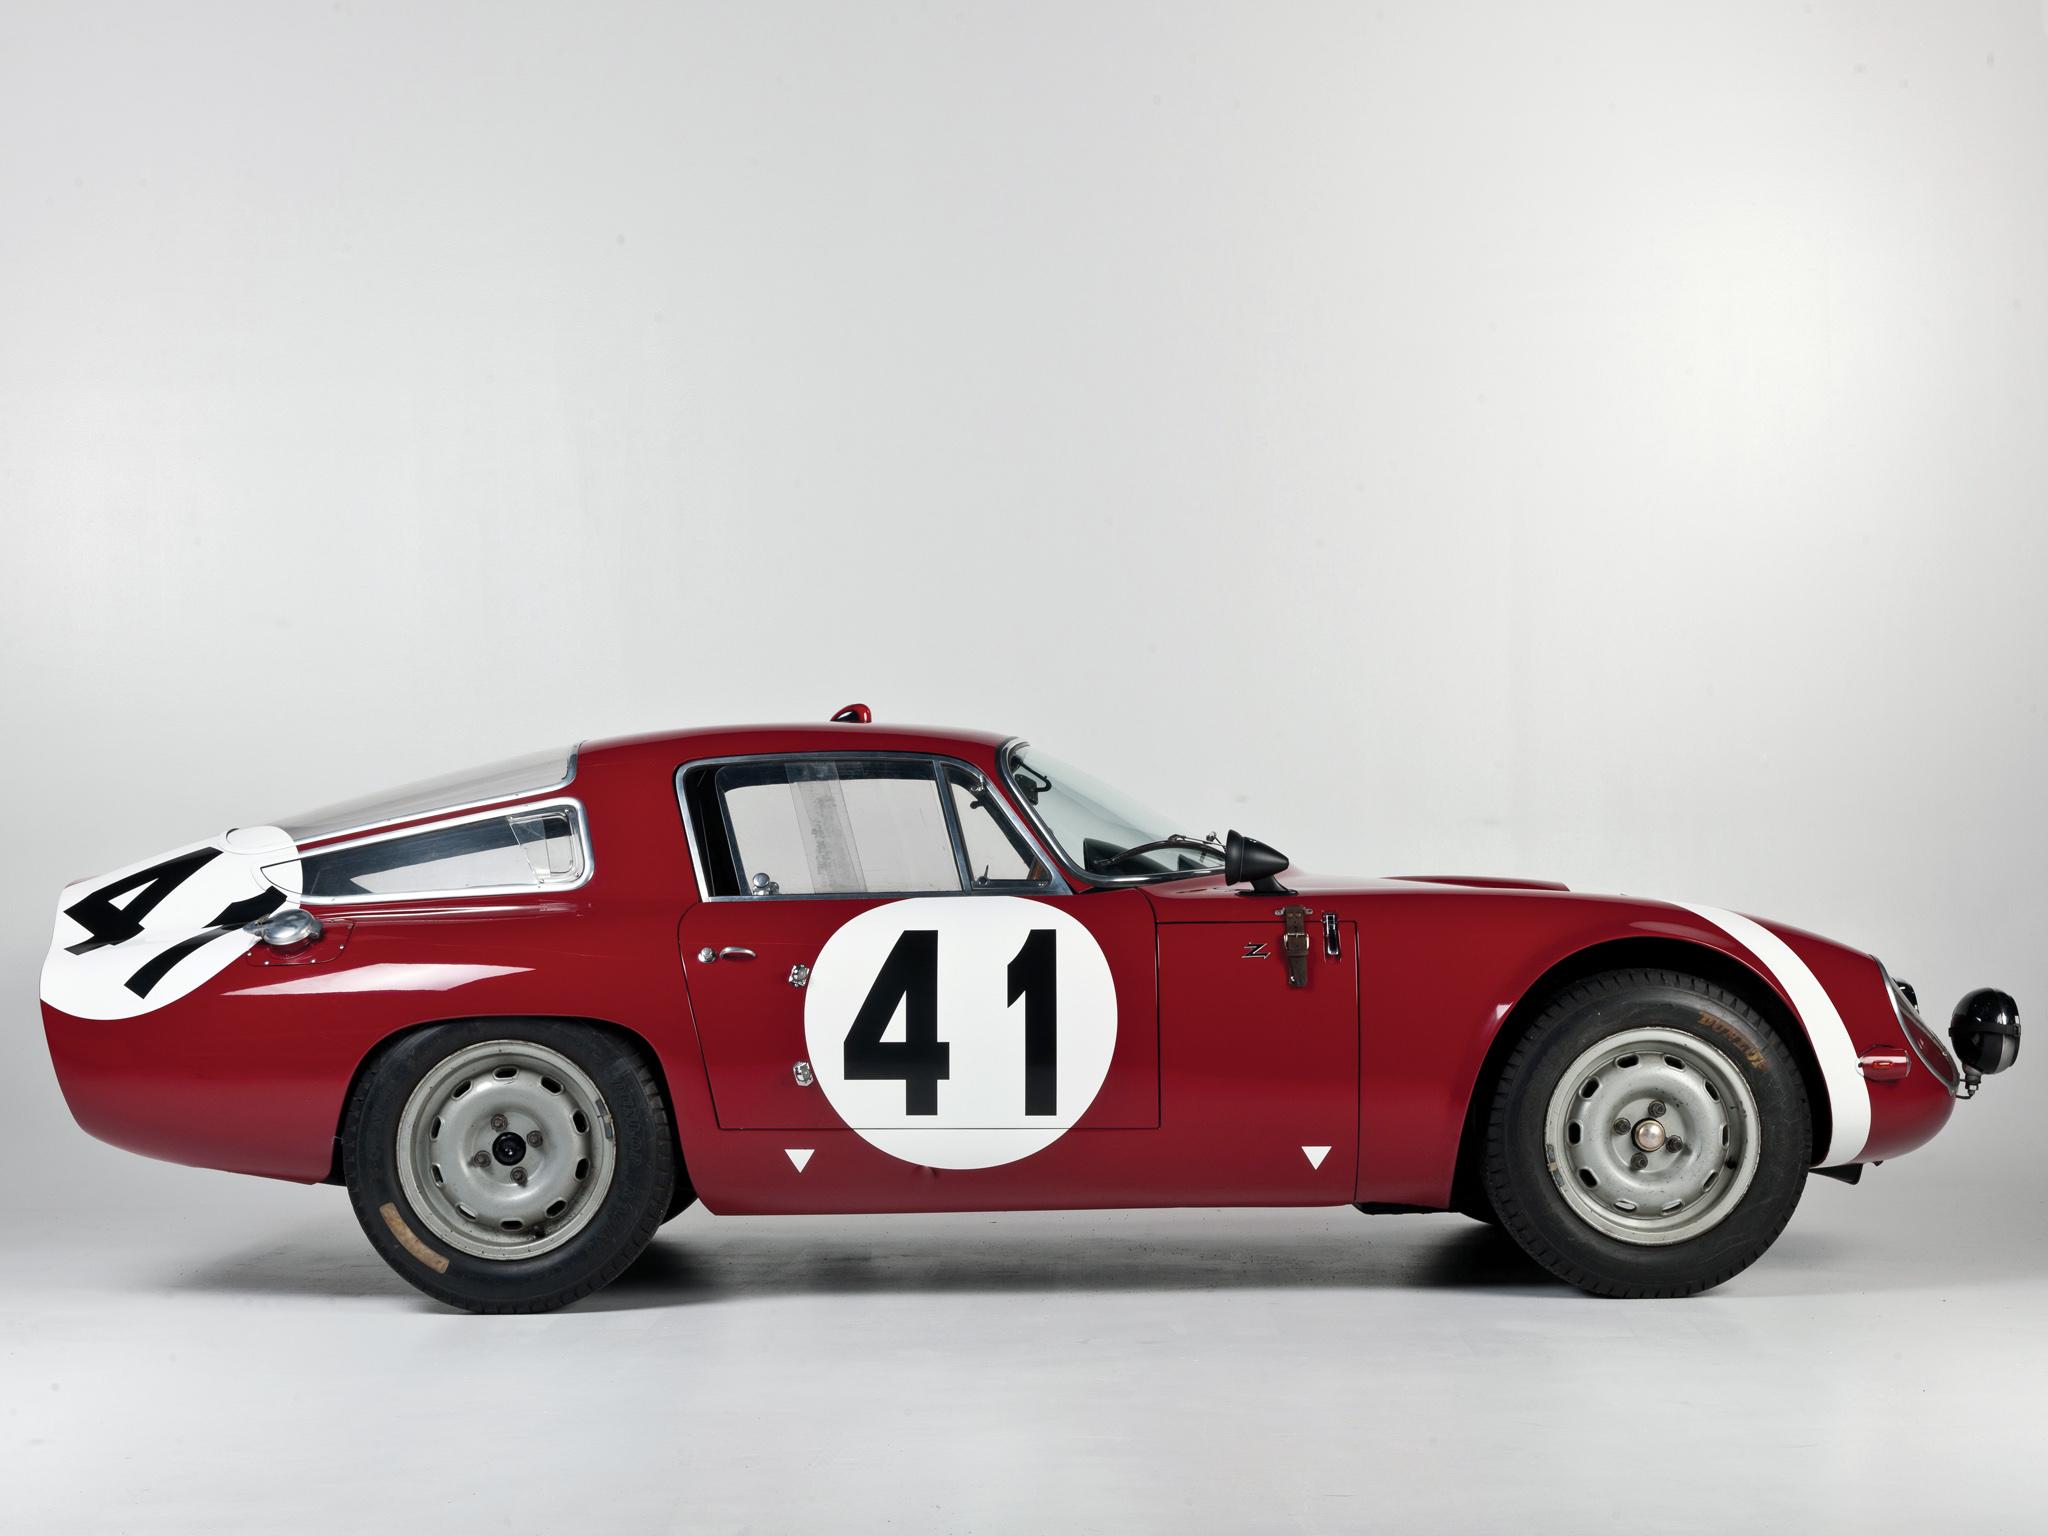 1963 Alfa Romeo Giulia Tz 105 Rally Car Race Racing Classic Wallpaper 2048x1536 147987 Wallpaperup